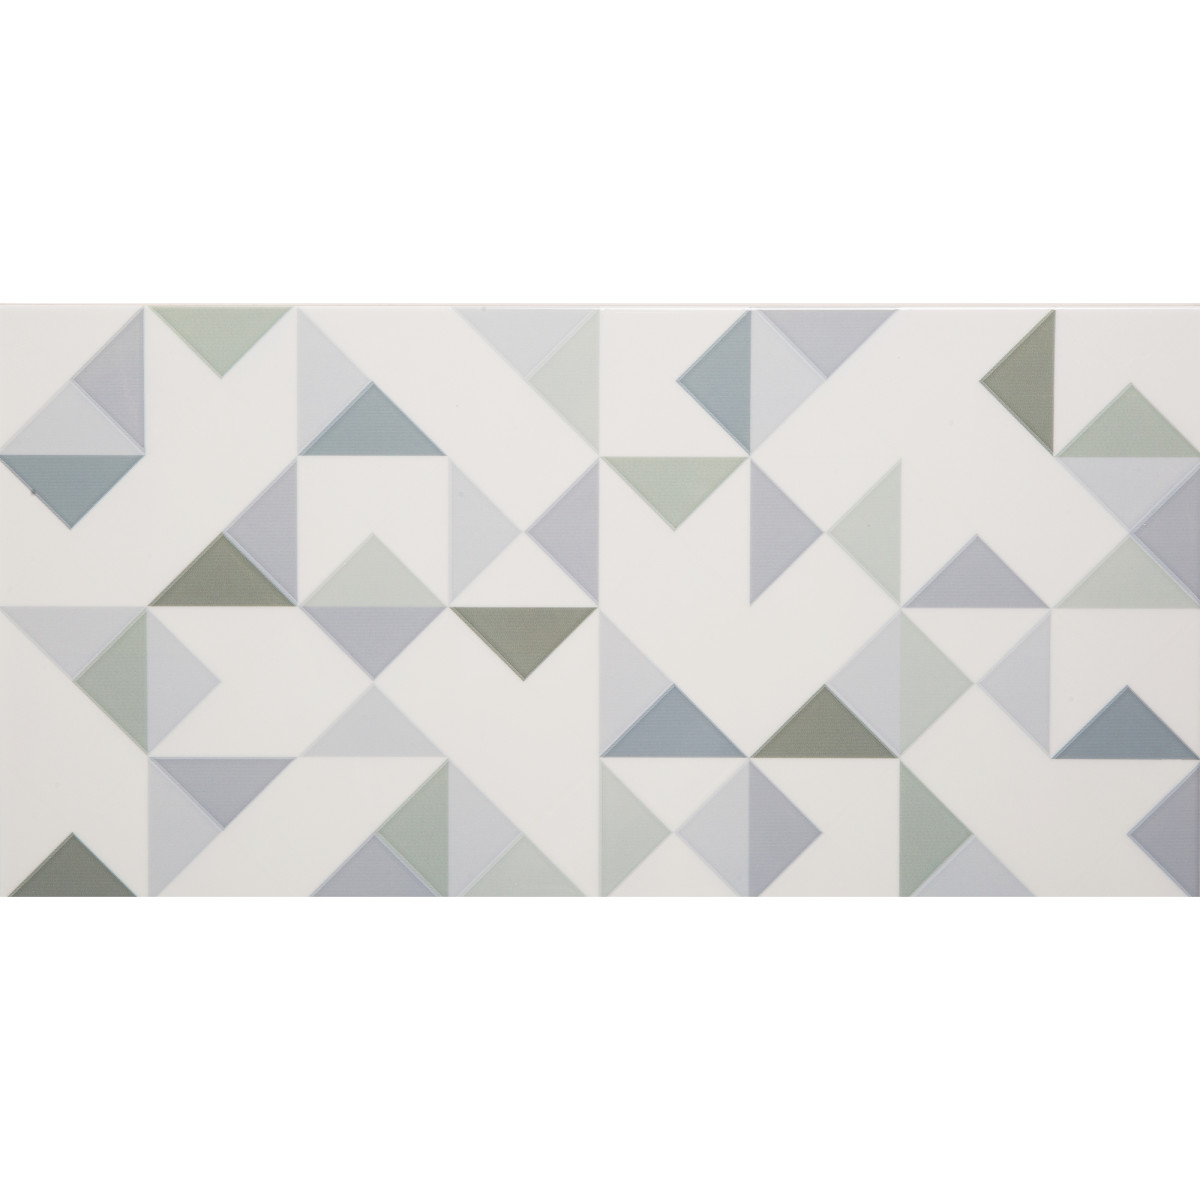 Плитка настенная Керкира 7Д тип 2 60x30 см 1.98 м² цвет мультиколор